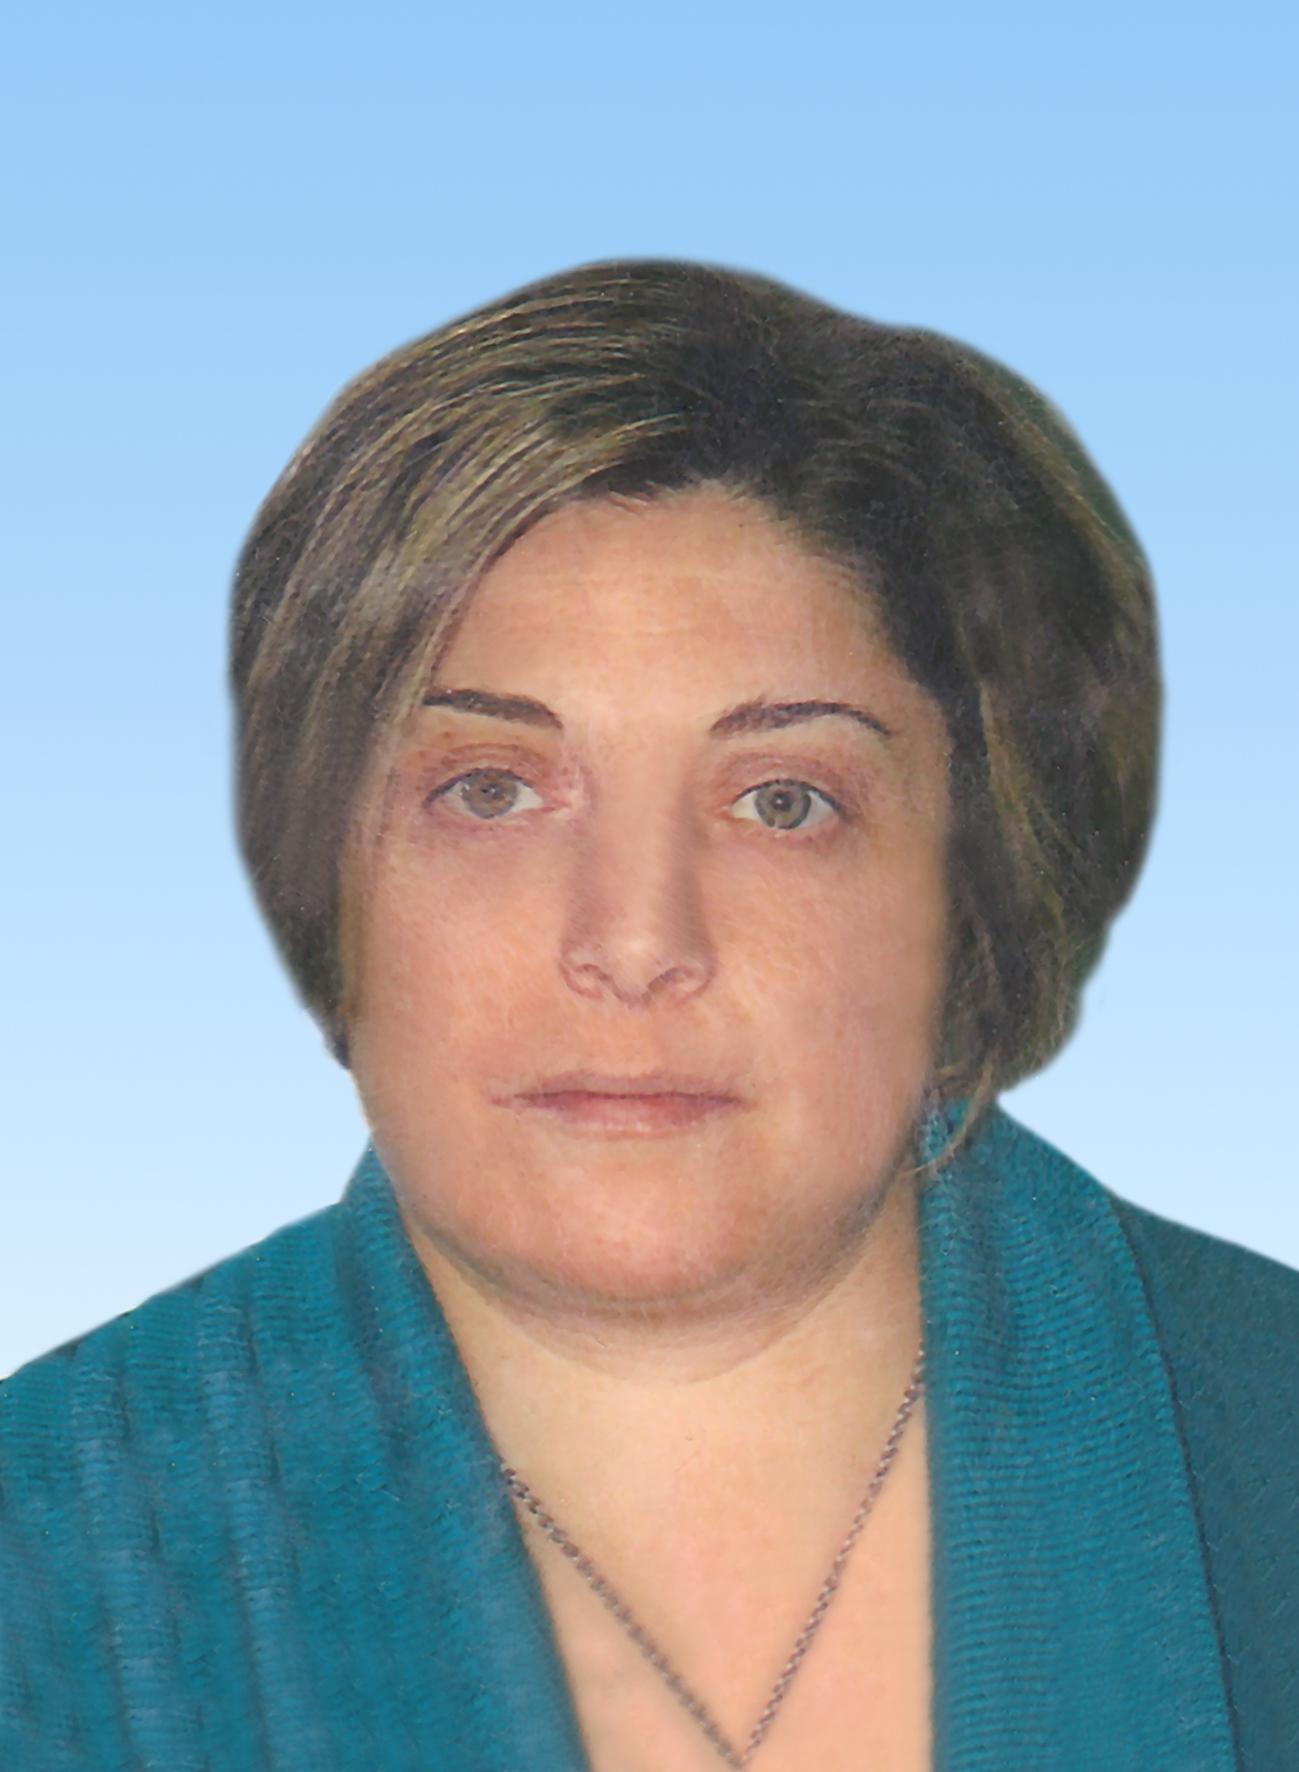 ARMENIA VINCENZA